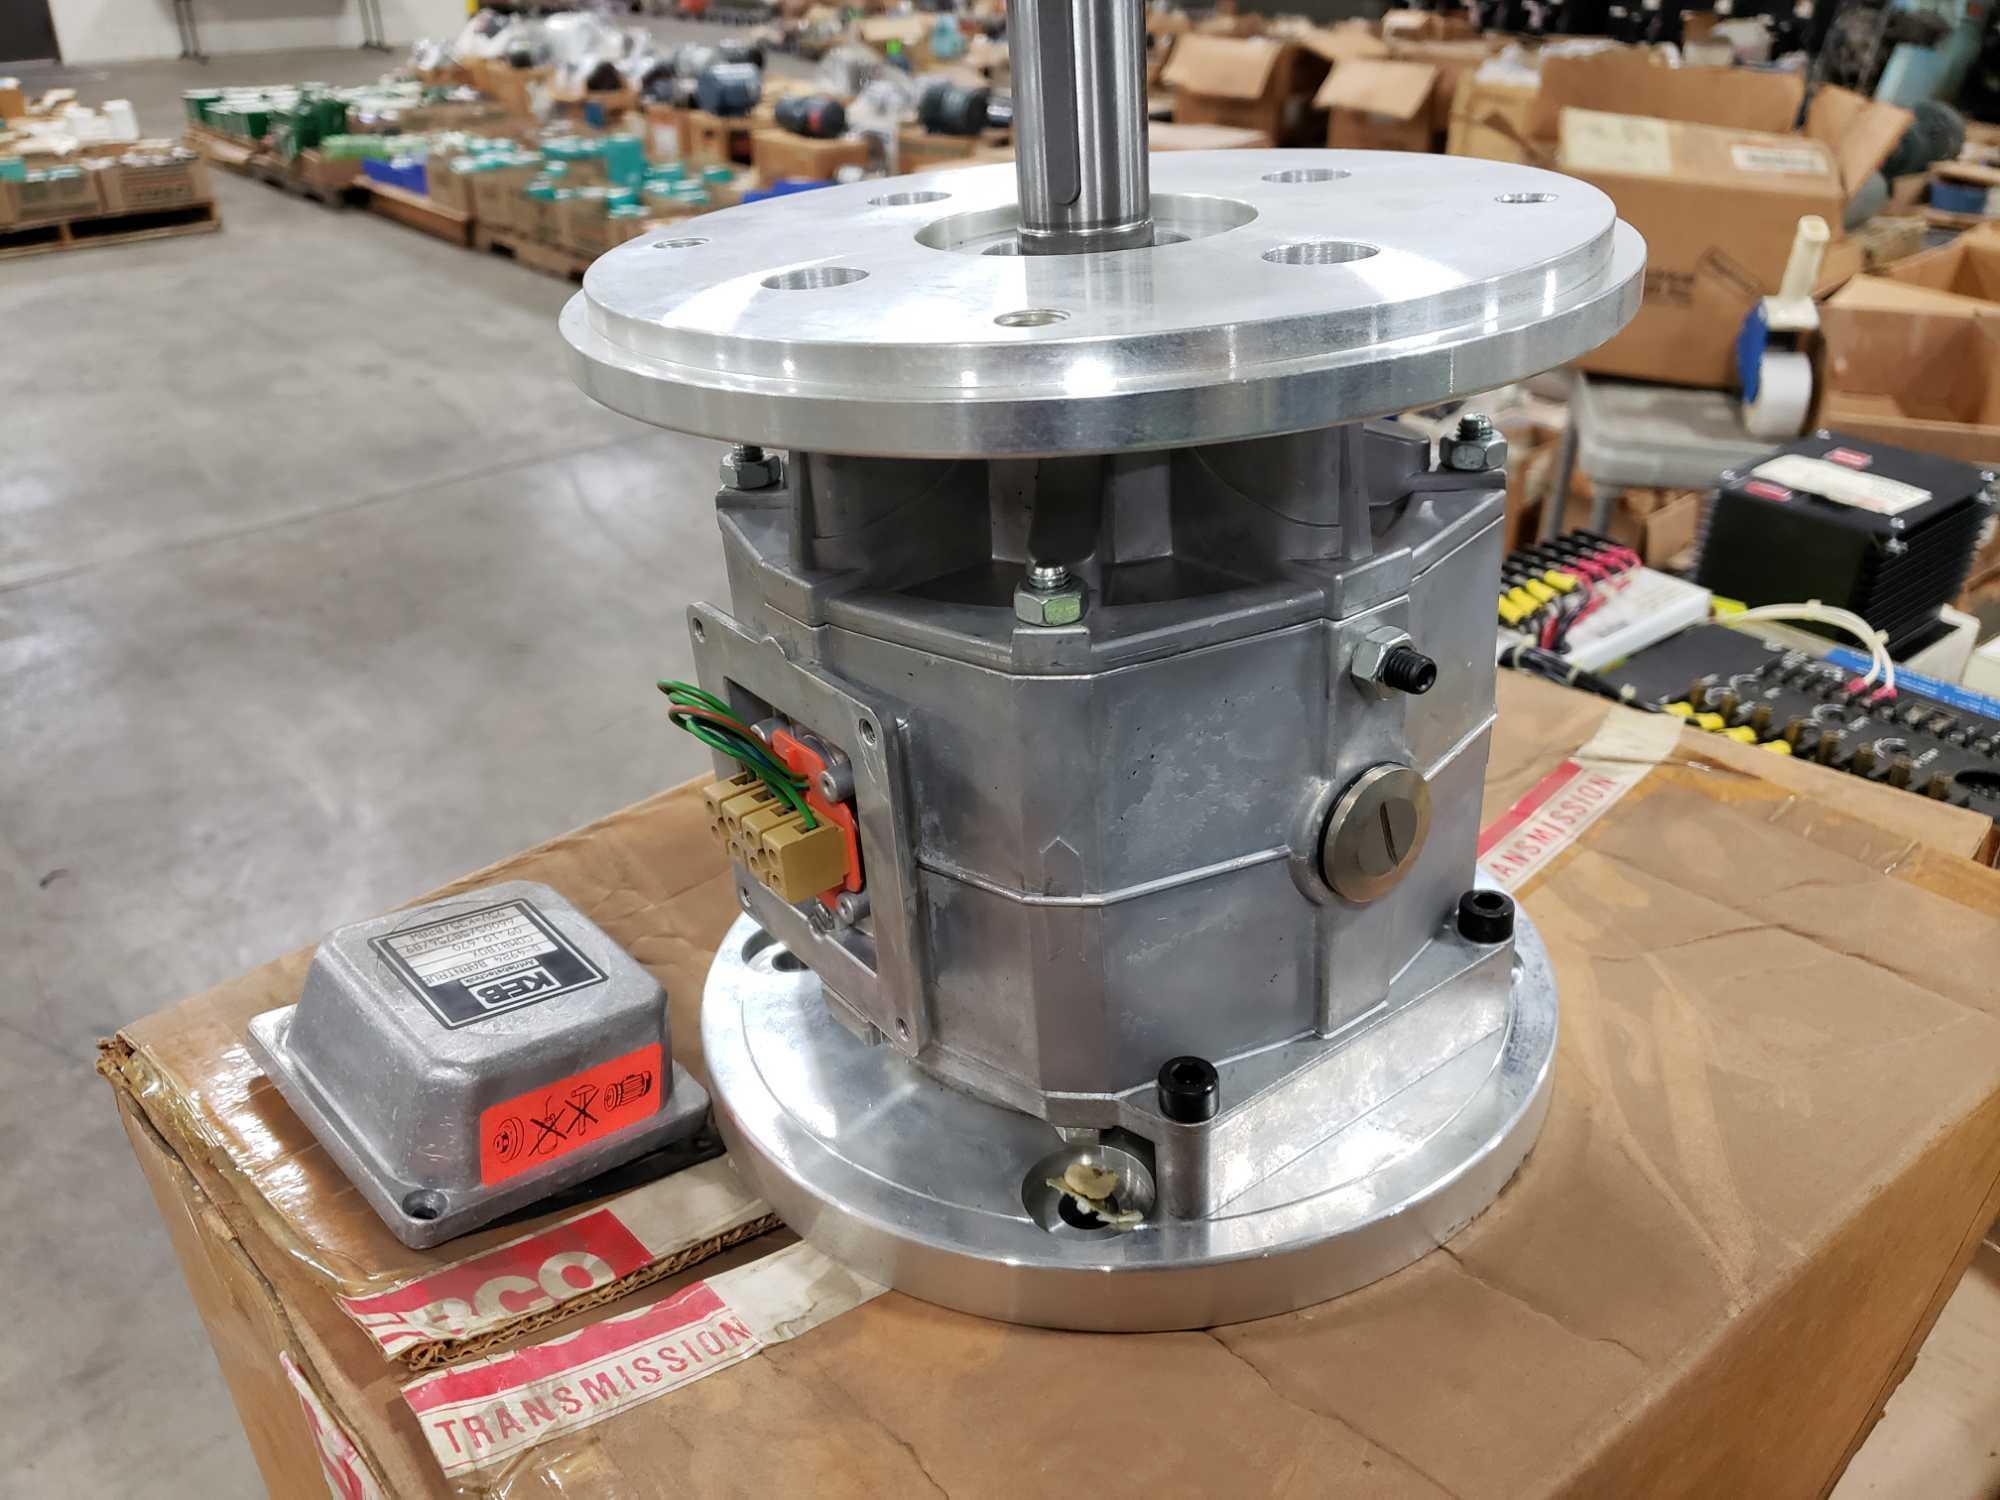 KEB Combibox model 09.10-670. New in box. - Image 3 of 3